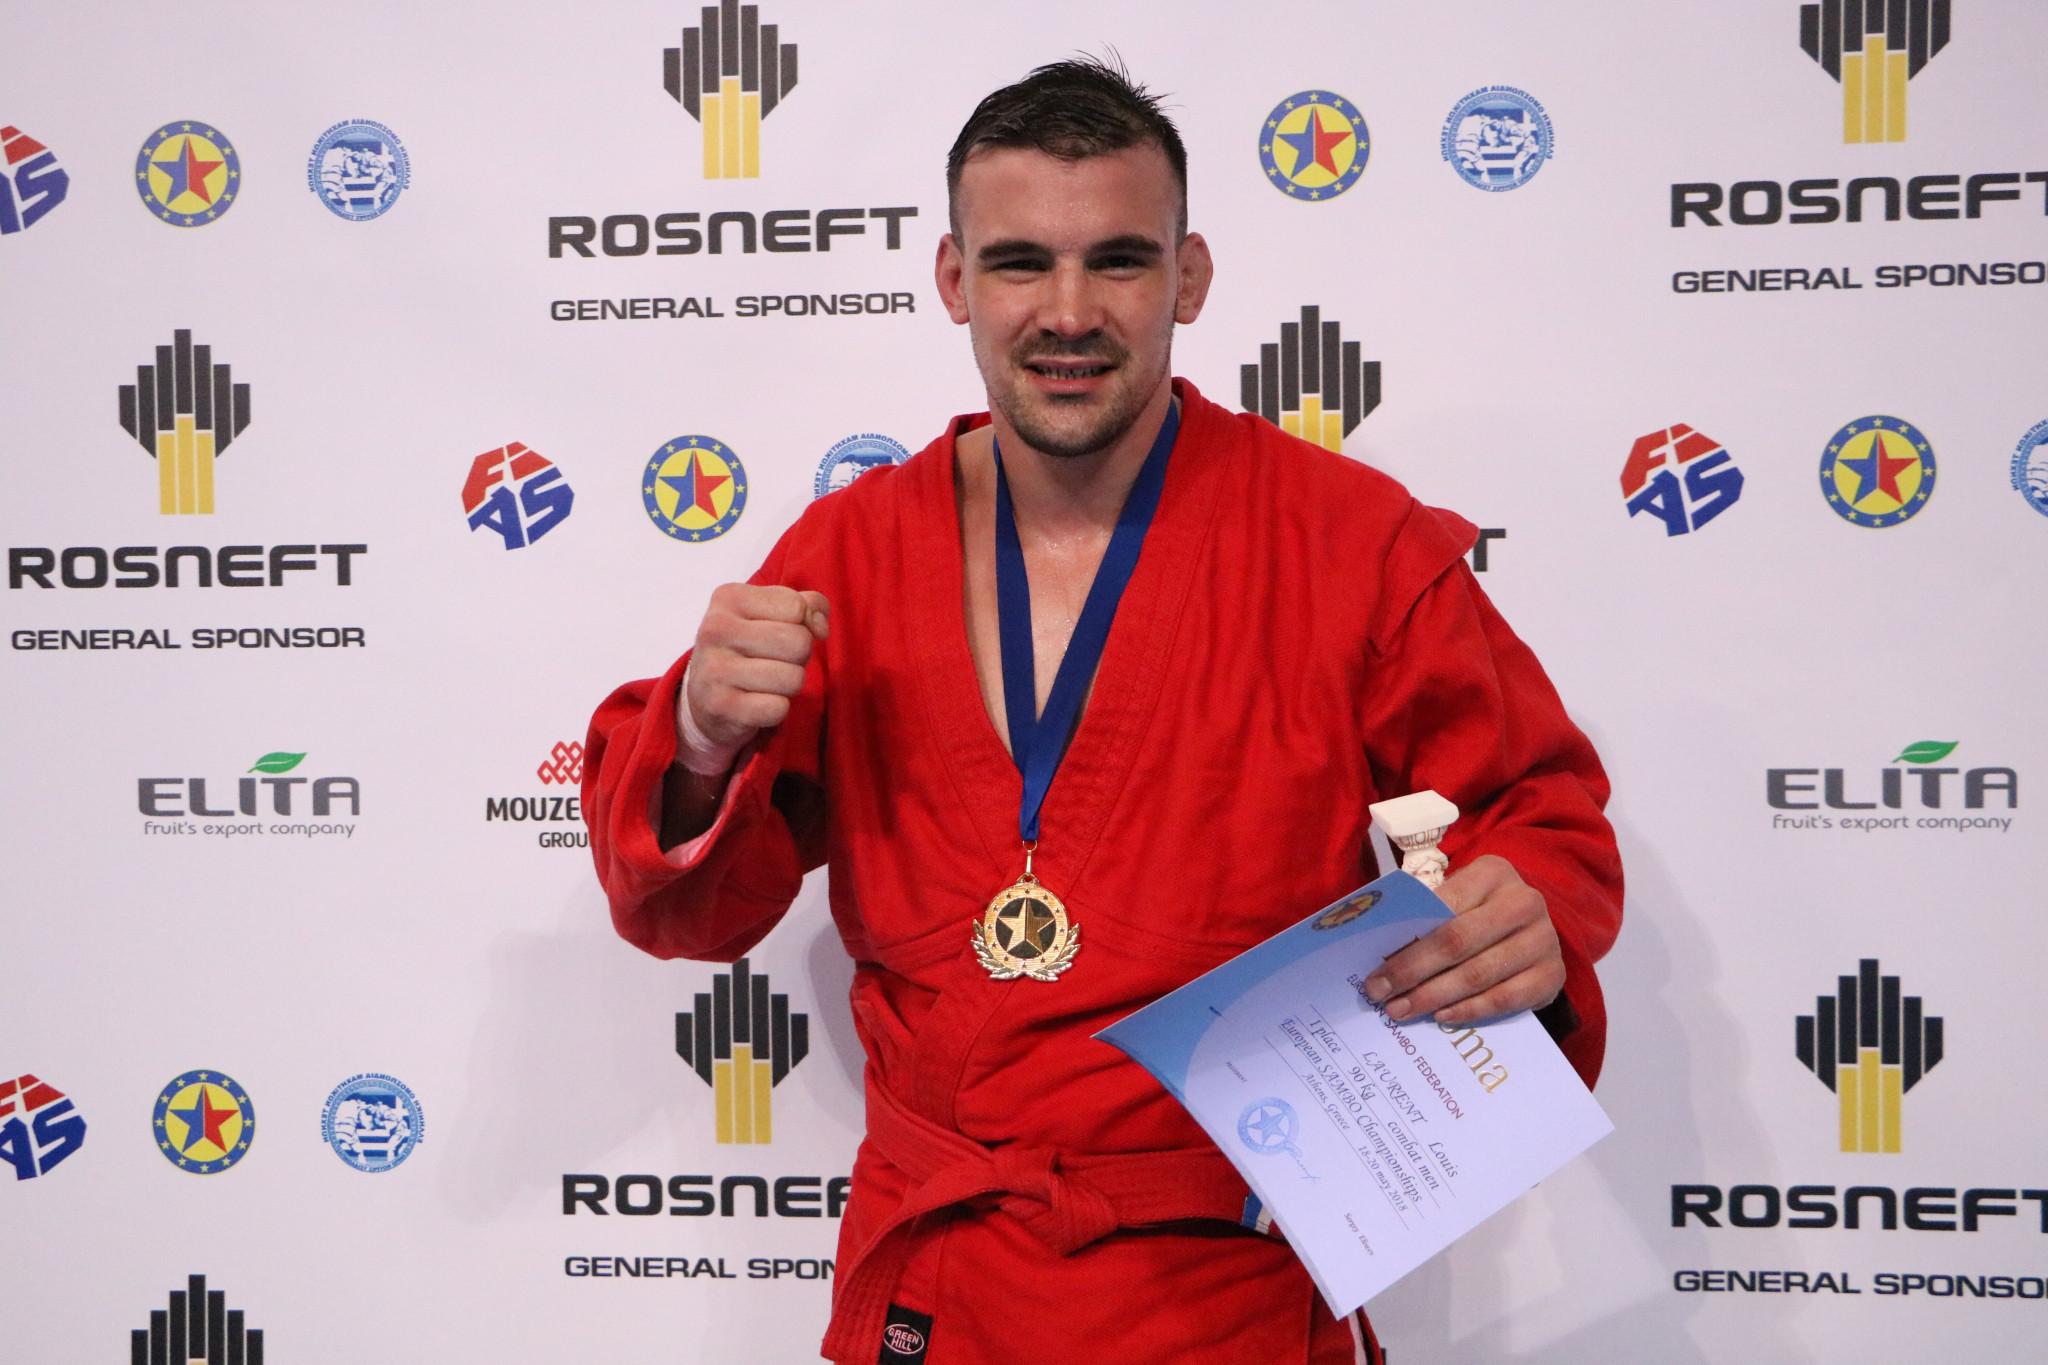 France's Louis Laurent put on an excellent display to claim the combat men's 90kg gold medal ©FIAS